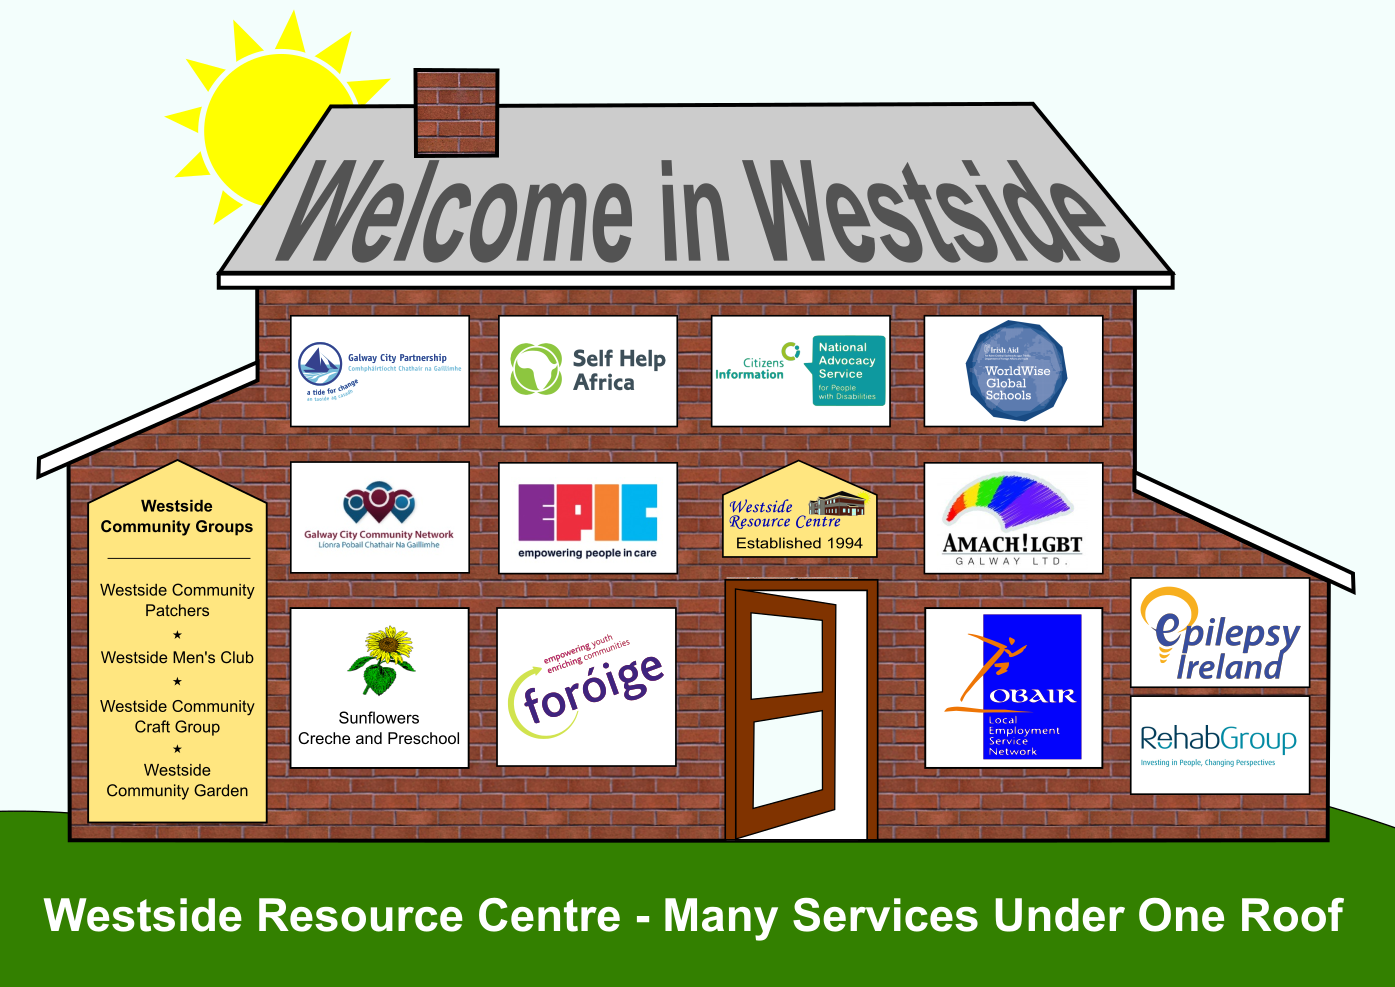 Westside Resource Centre